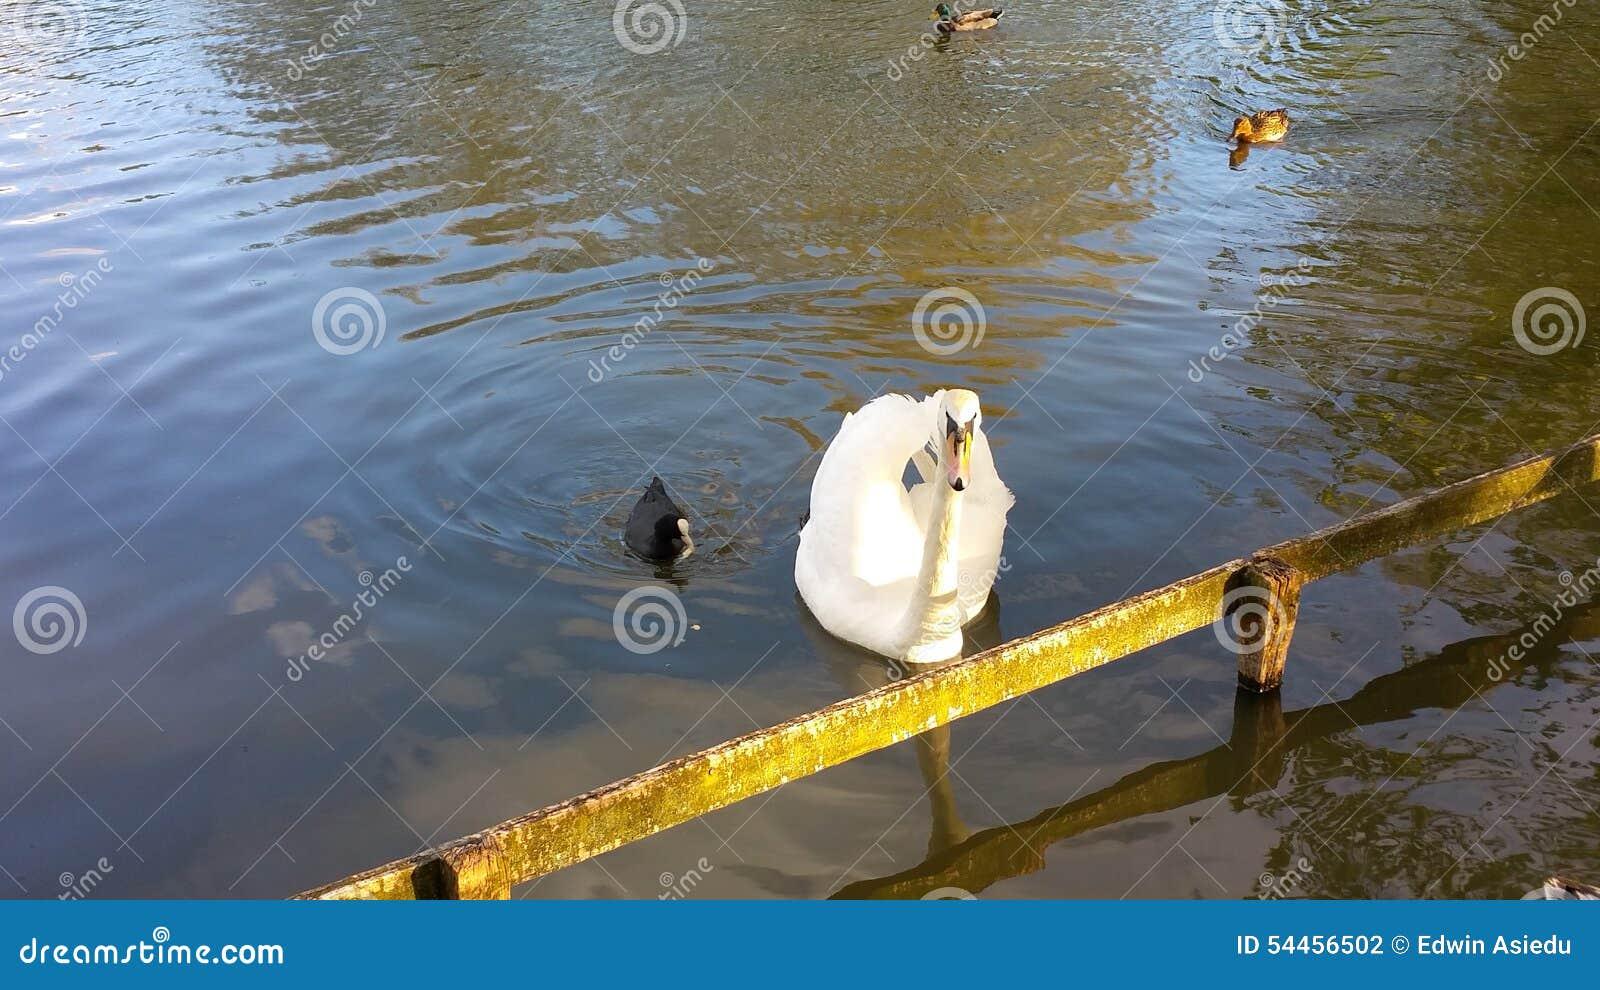 White Swan and black duck swimming